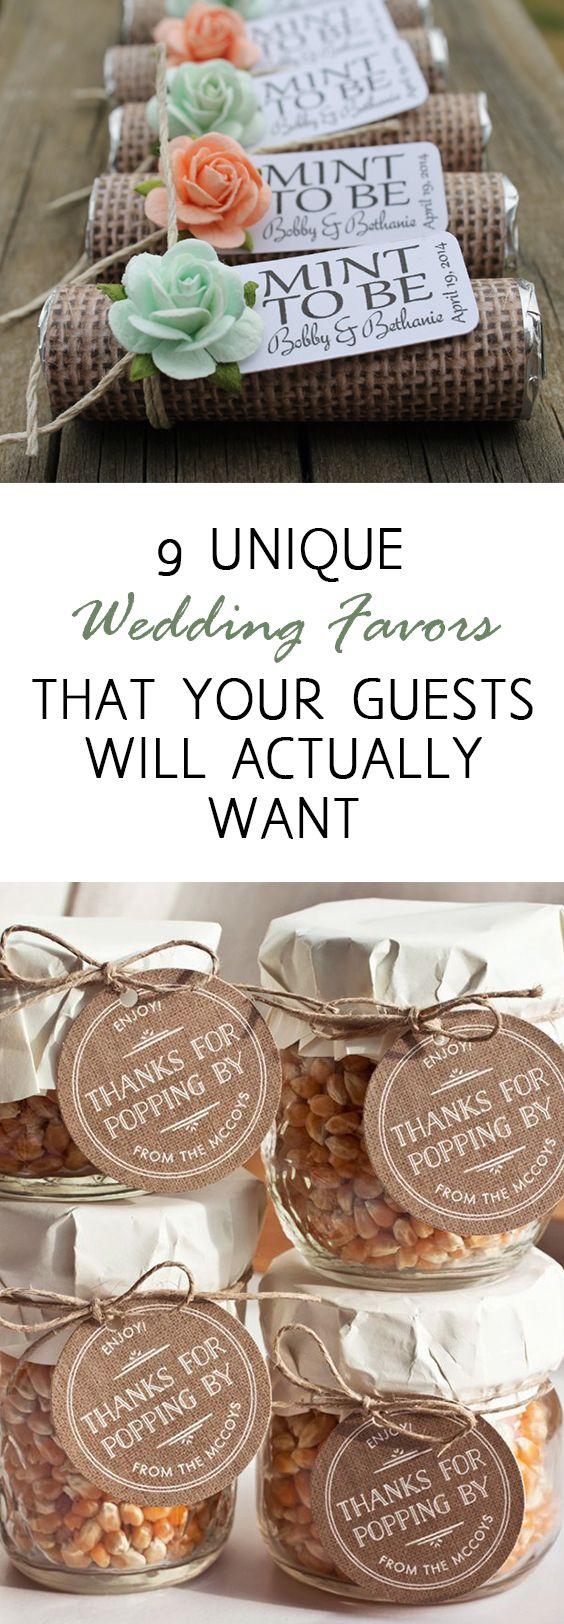 cheap wedding tips | Invitationjdi.co